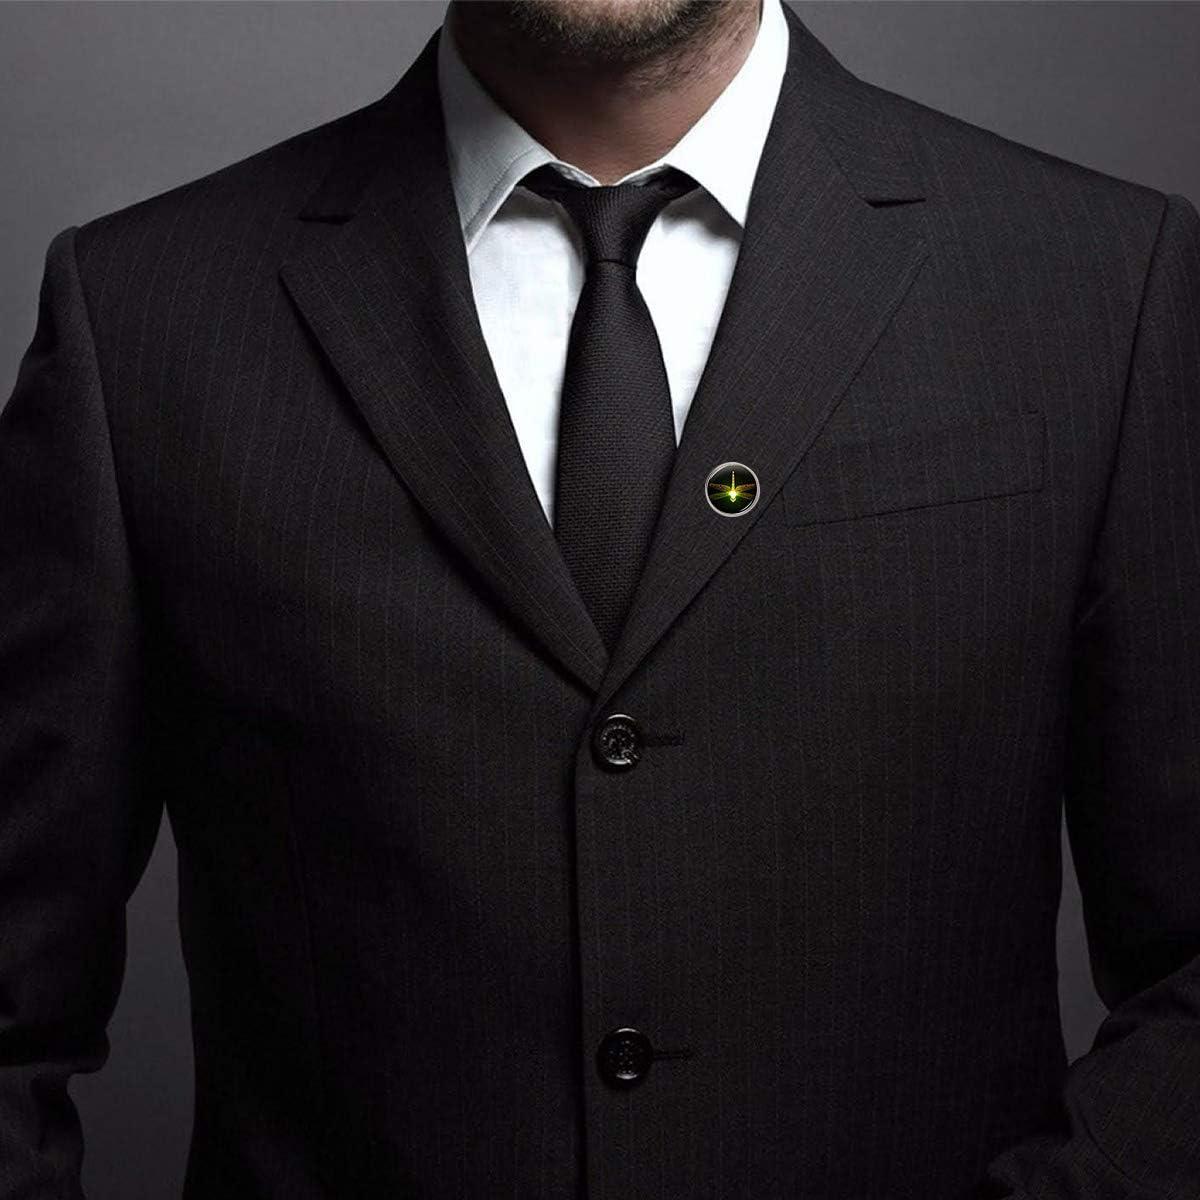 Custom Lapel Pin Brooches Dragon Fly Banquet Badge Pins Trendy Accessory Jacket T-Shirt Bag Hat Shoe